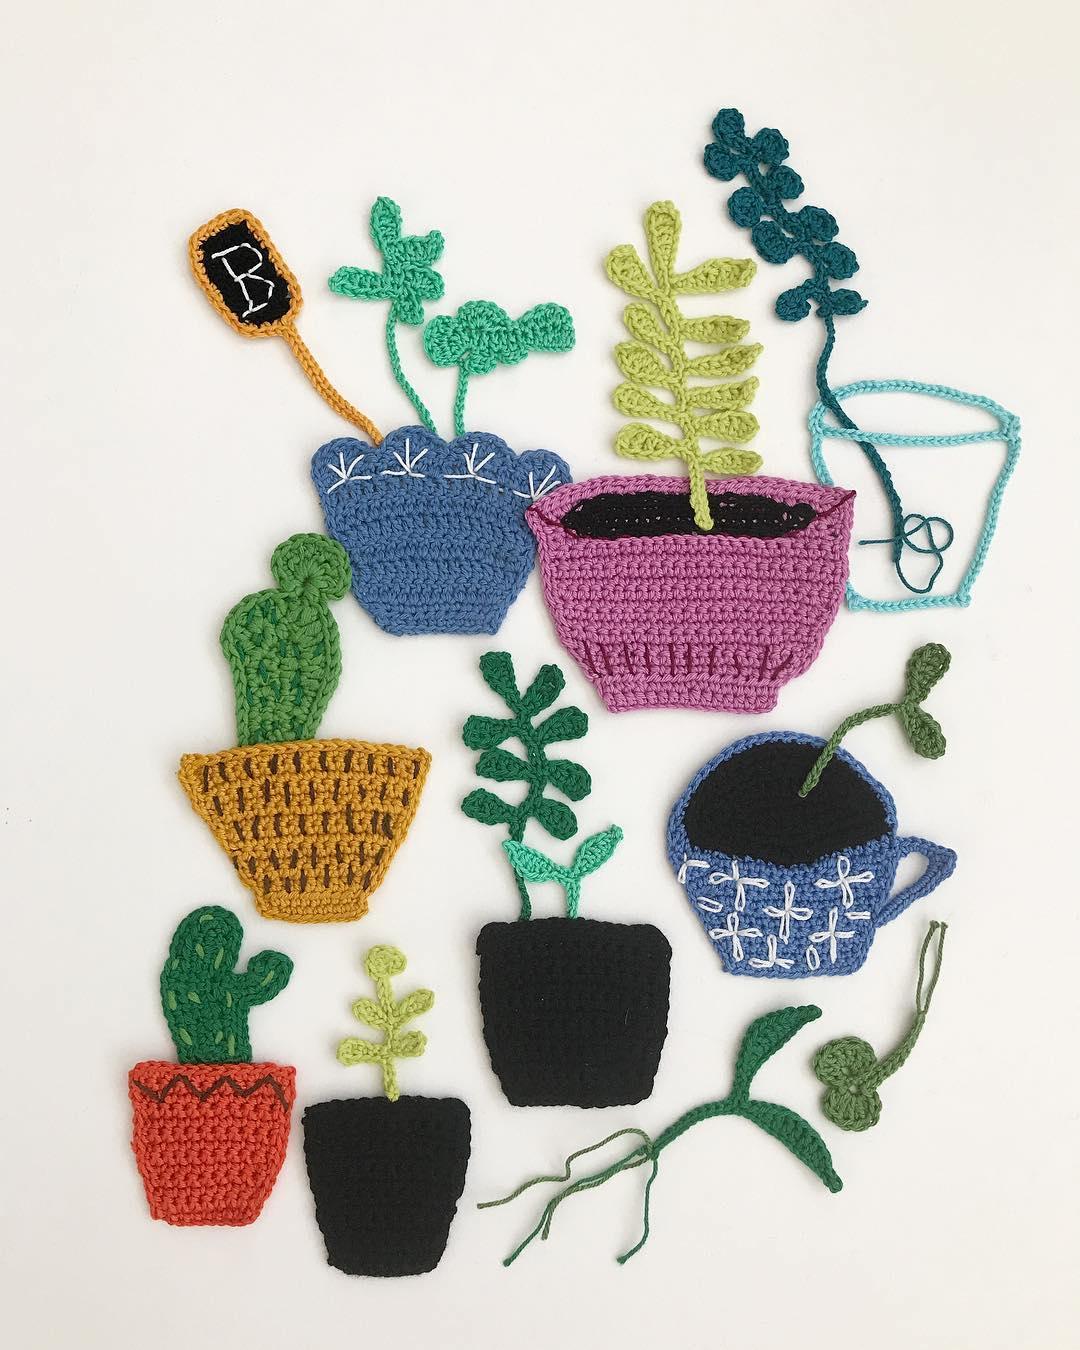 Freeform crochet art by Tuija Heikkinen